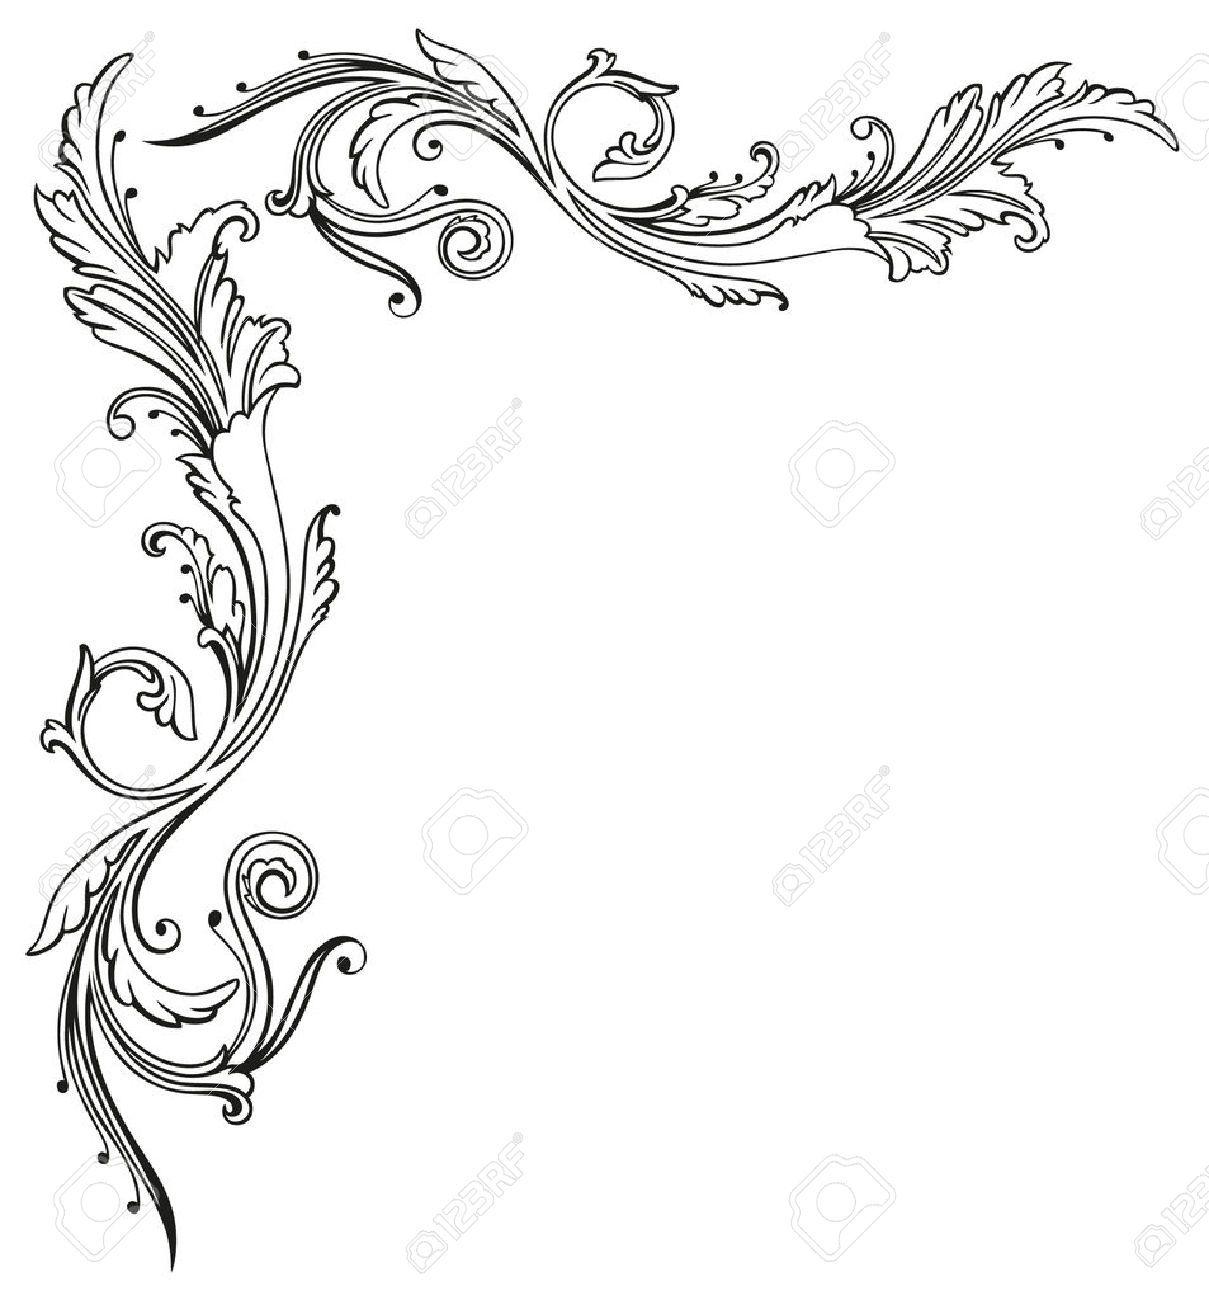 23246925 vintage tendril floral and filigree border stock for Filigree border designs